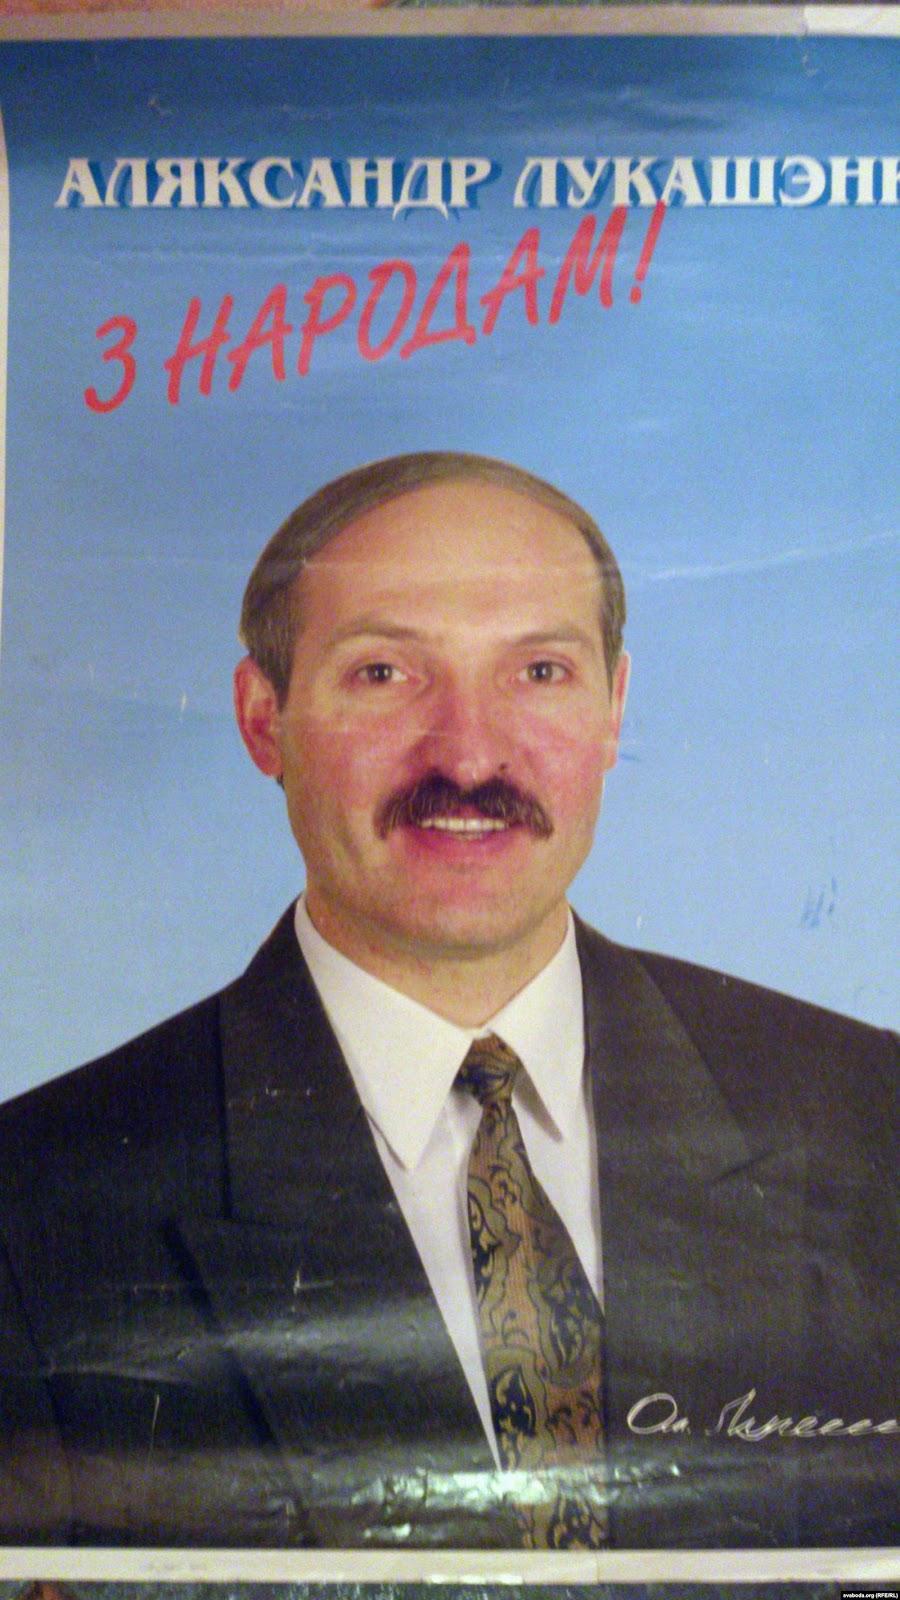 Предвыборный плакат Александра Лукашенко, 1994 год. Фото: svaboda.org